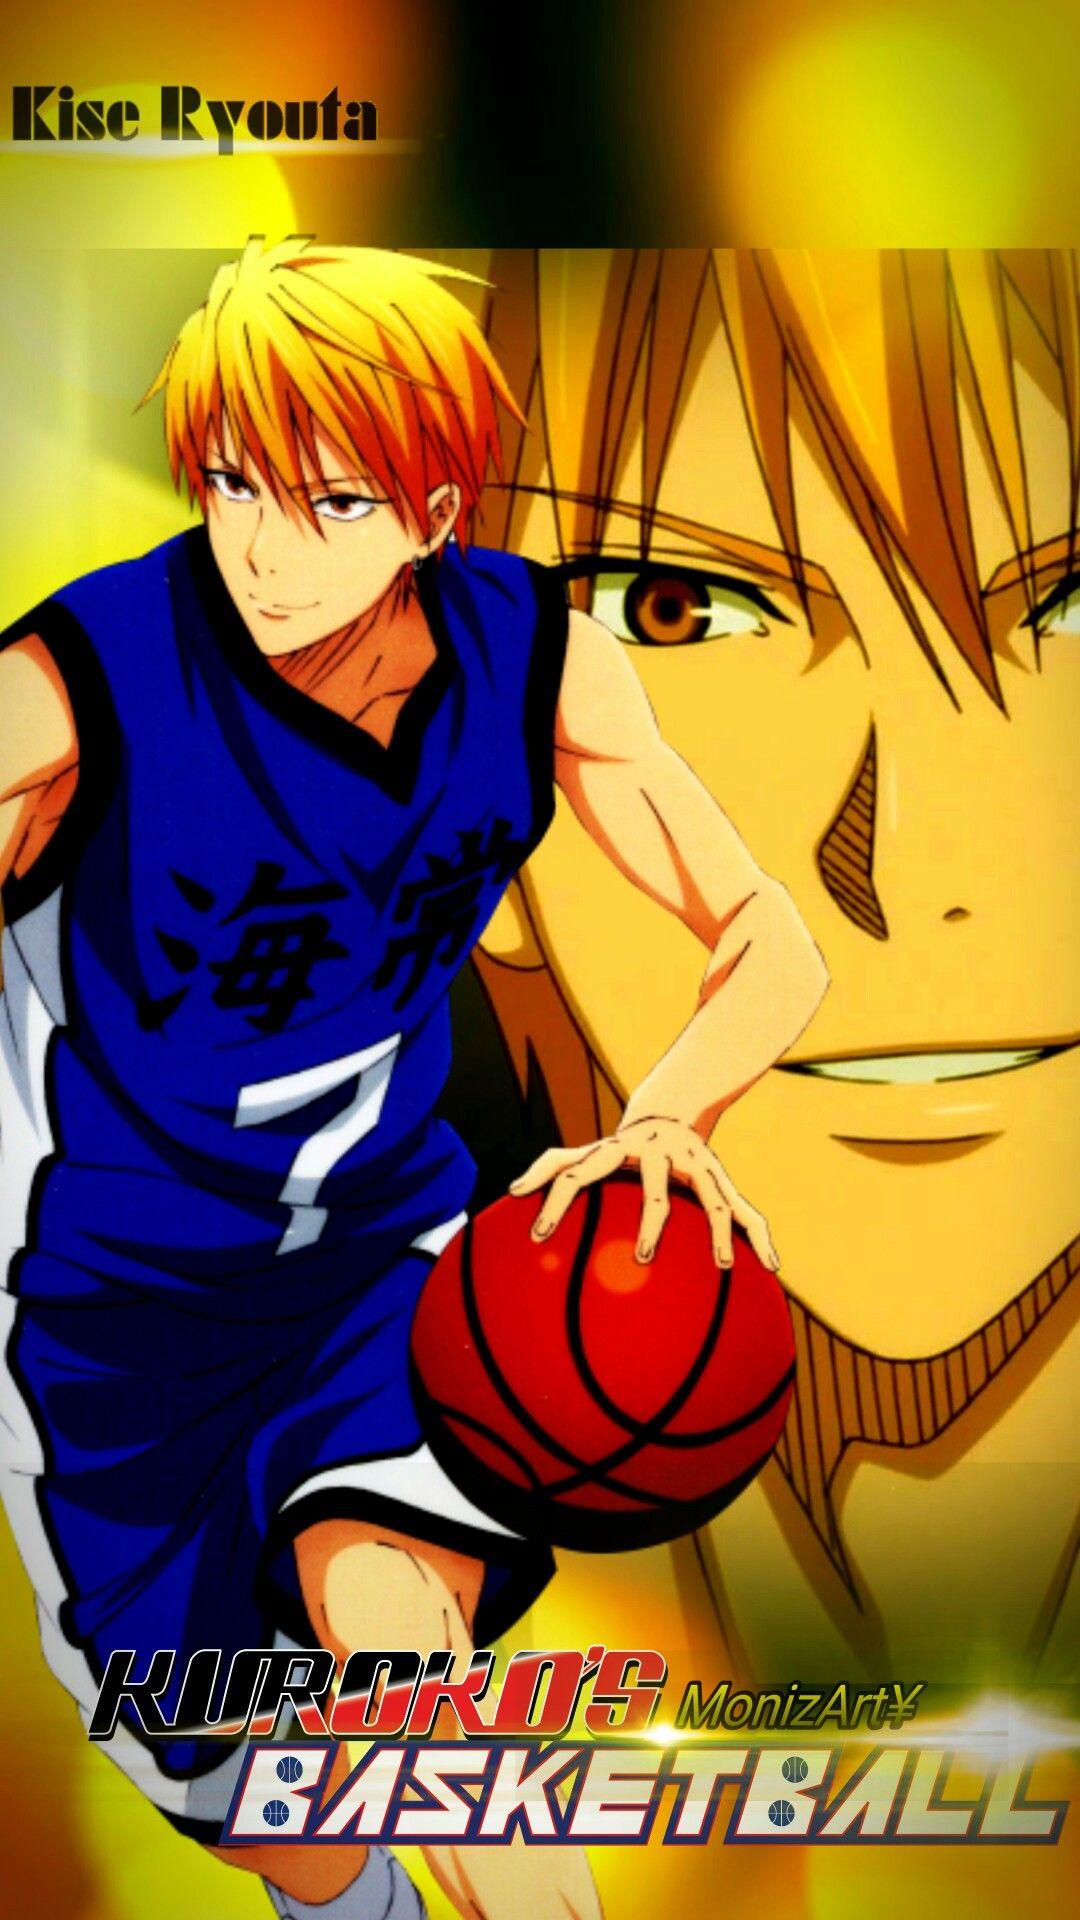 Kise Ryouta Kuroko No Basket Hd Wallpaper By Monizart 黒